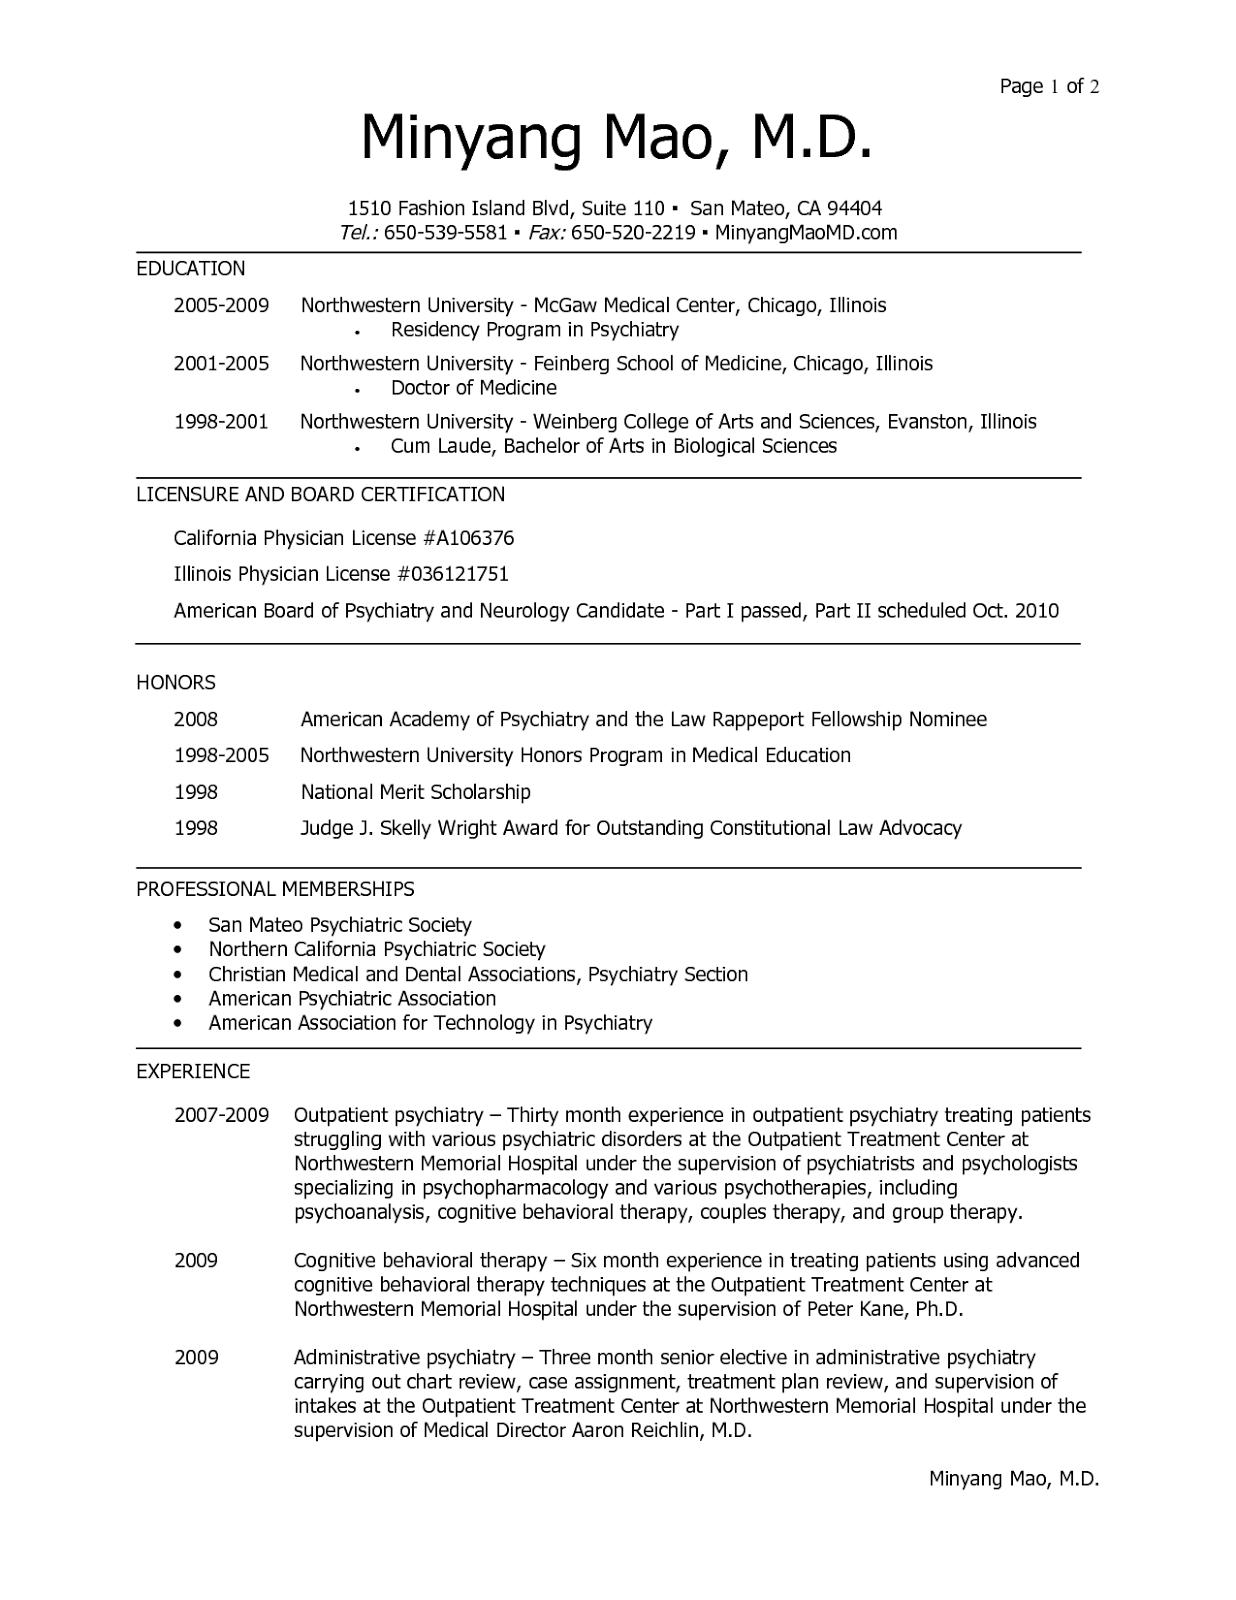 89 sample resume for government jobs 100 sample resume